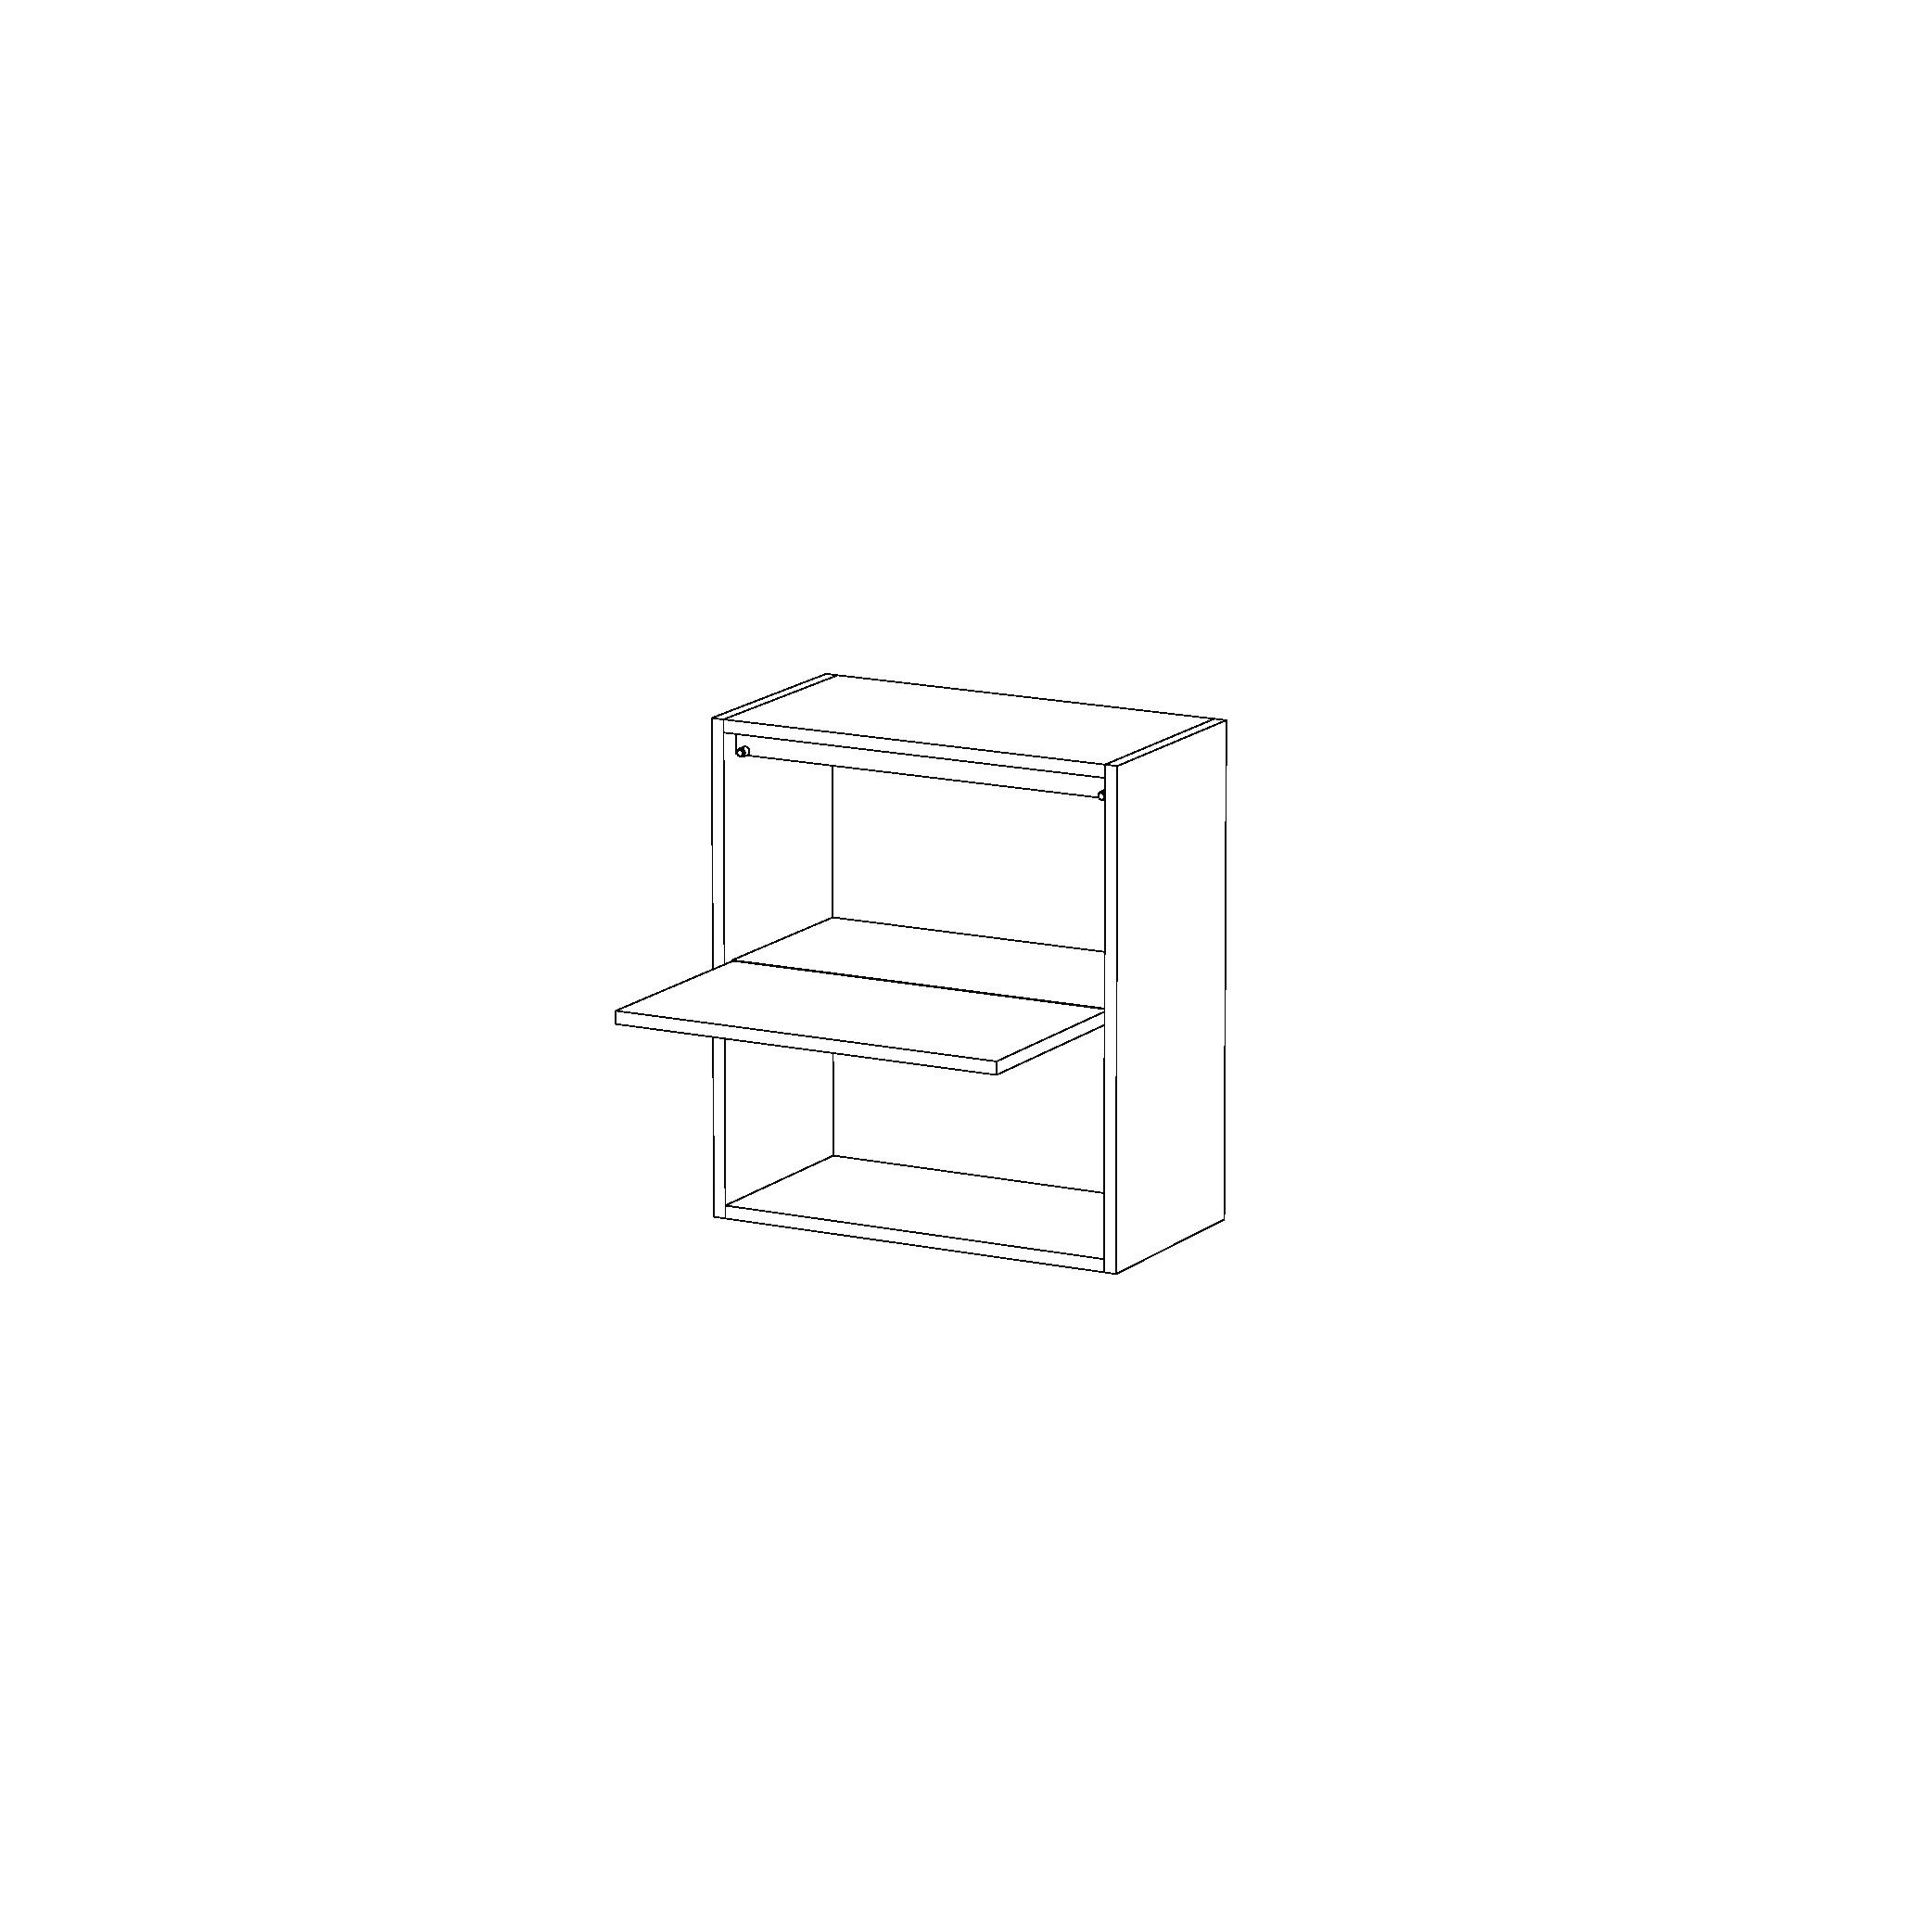 FLAP 2/6